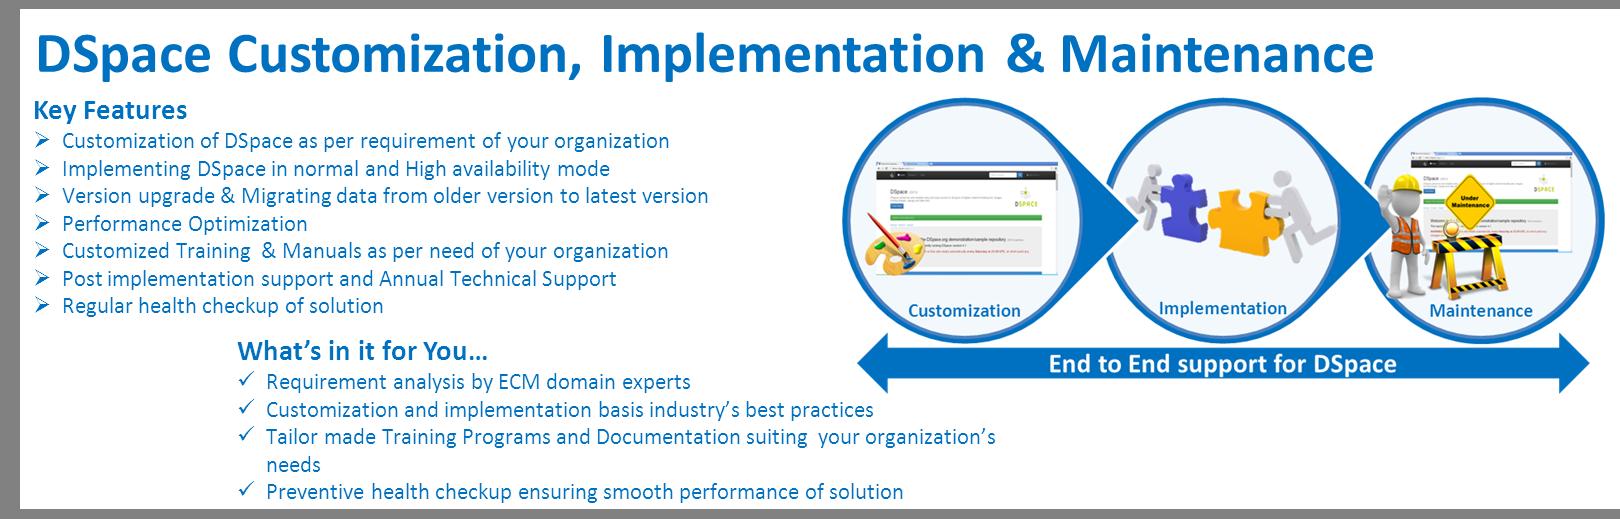 Dspace Customization Implementation & Maintenance